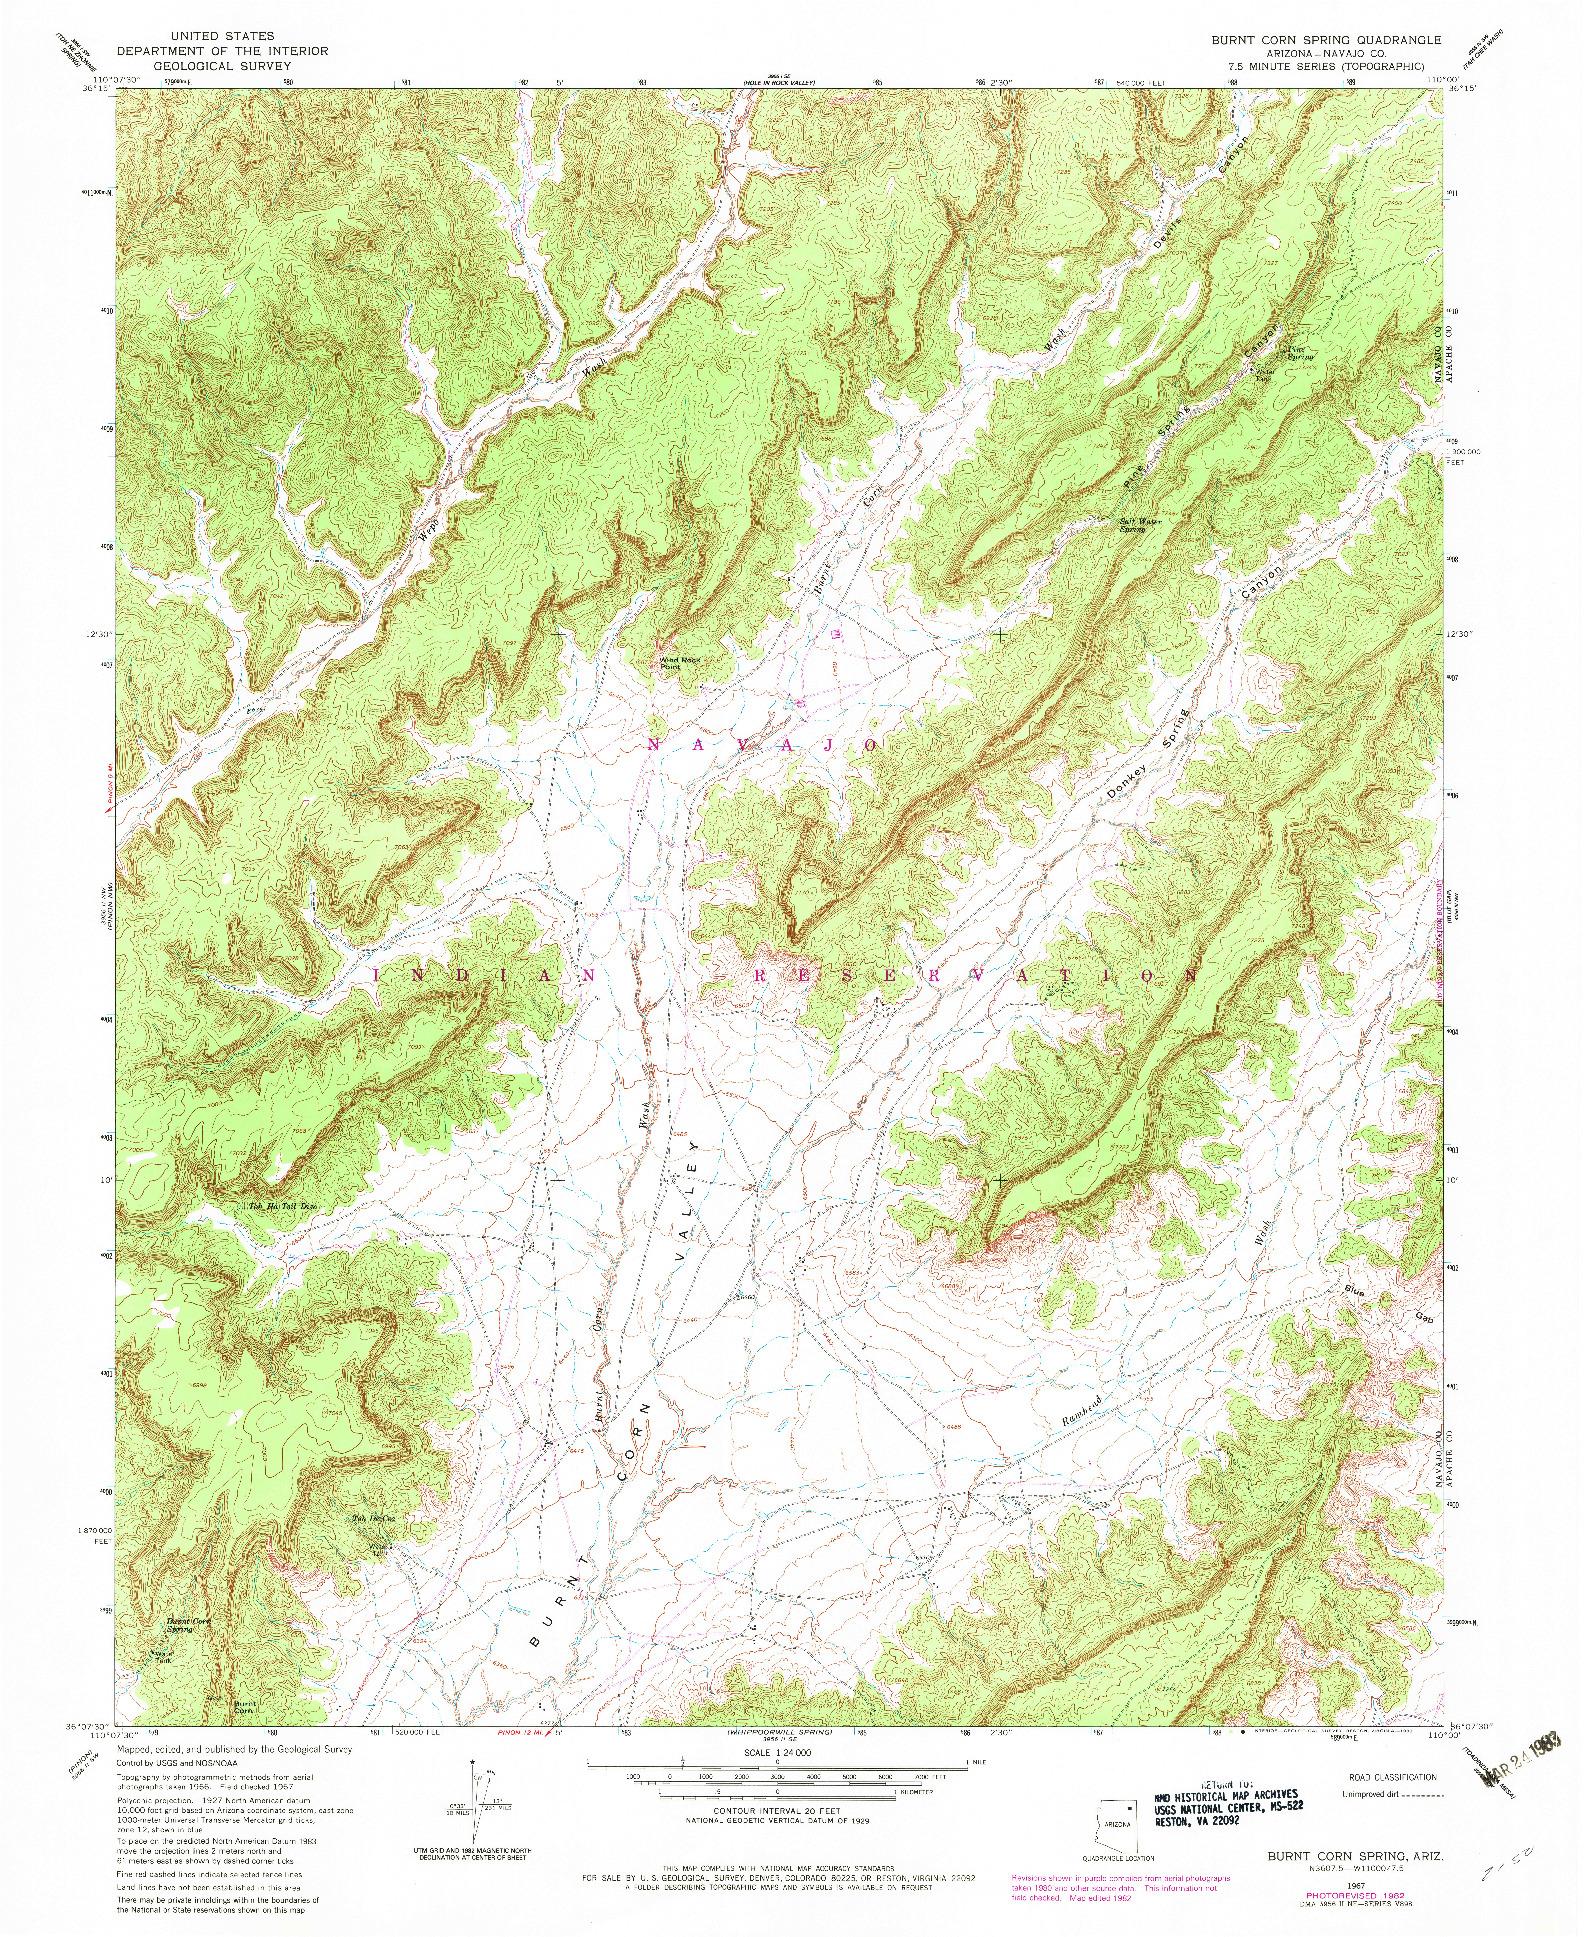 USGS 1:24000-SCALE QUADRANGLE FOR BURNT CORN SPRING, AZ 1967